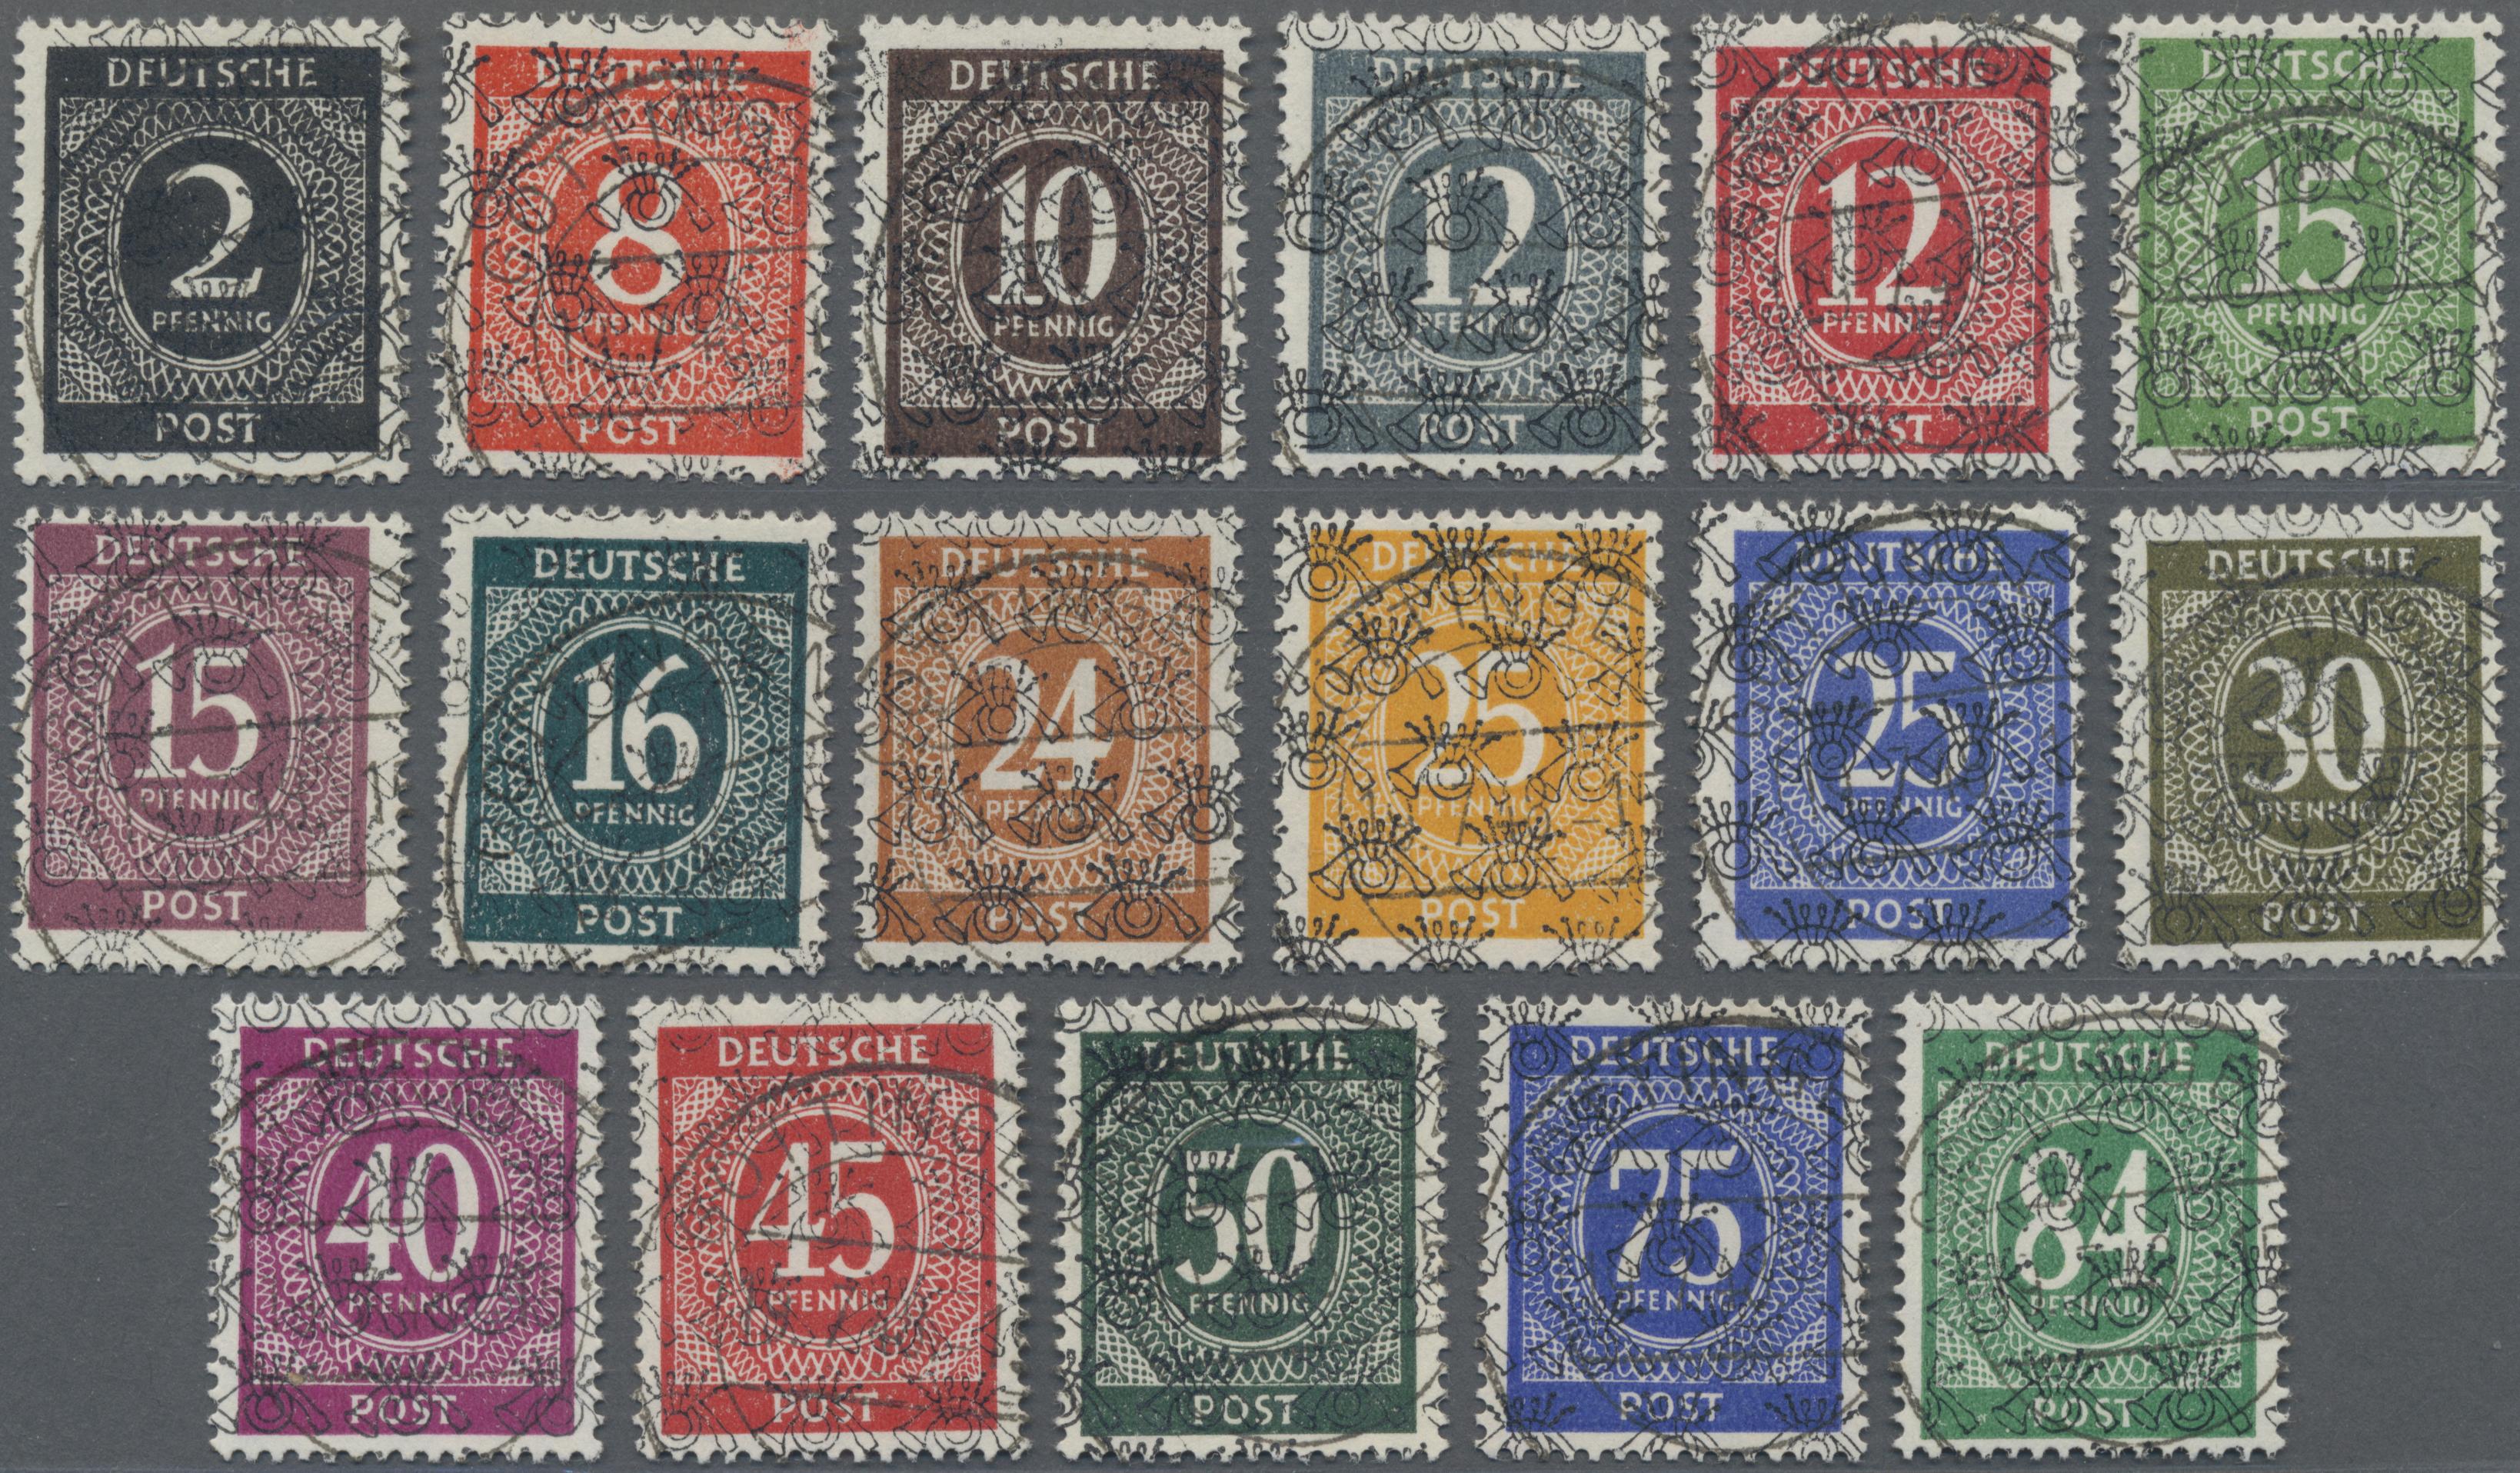 21 x 14,8 cm Farbe Blau Getr/änkt Trodat 9054 Handstempelkissen Gro/ß